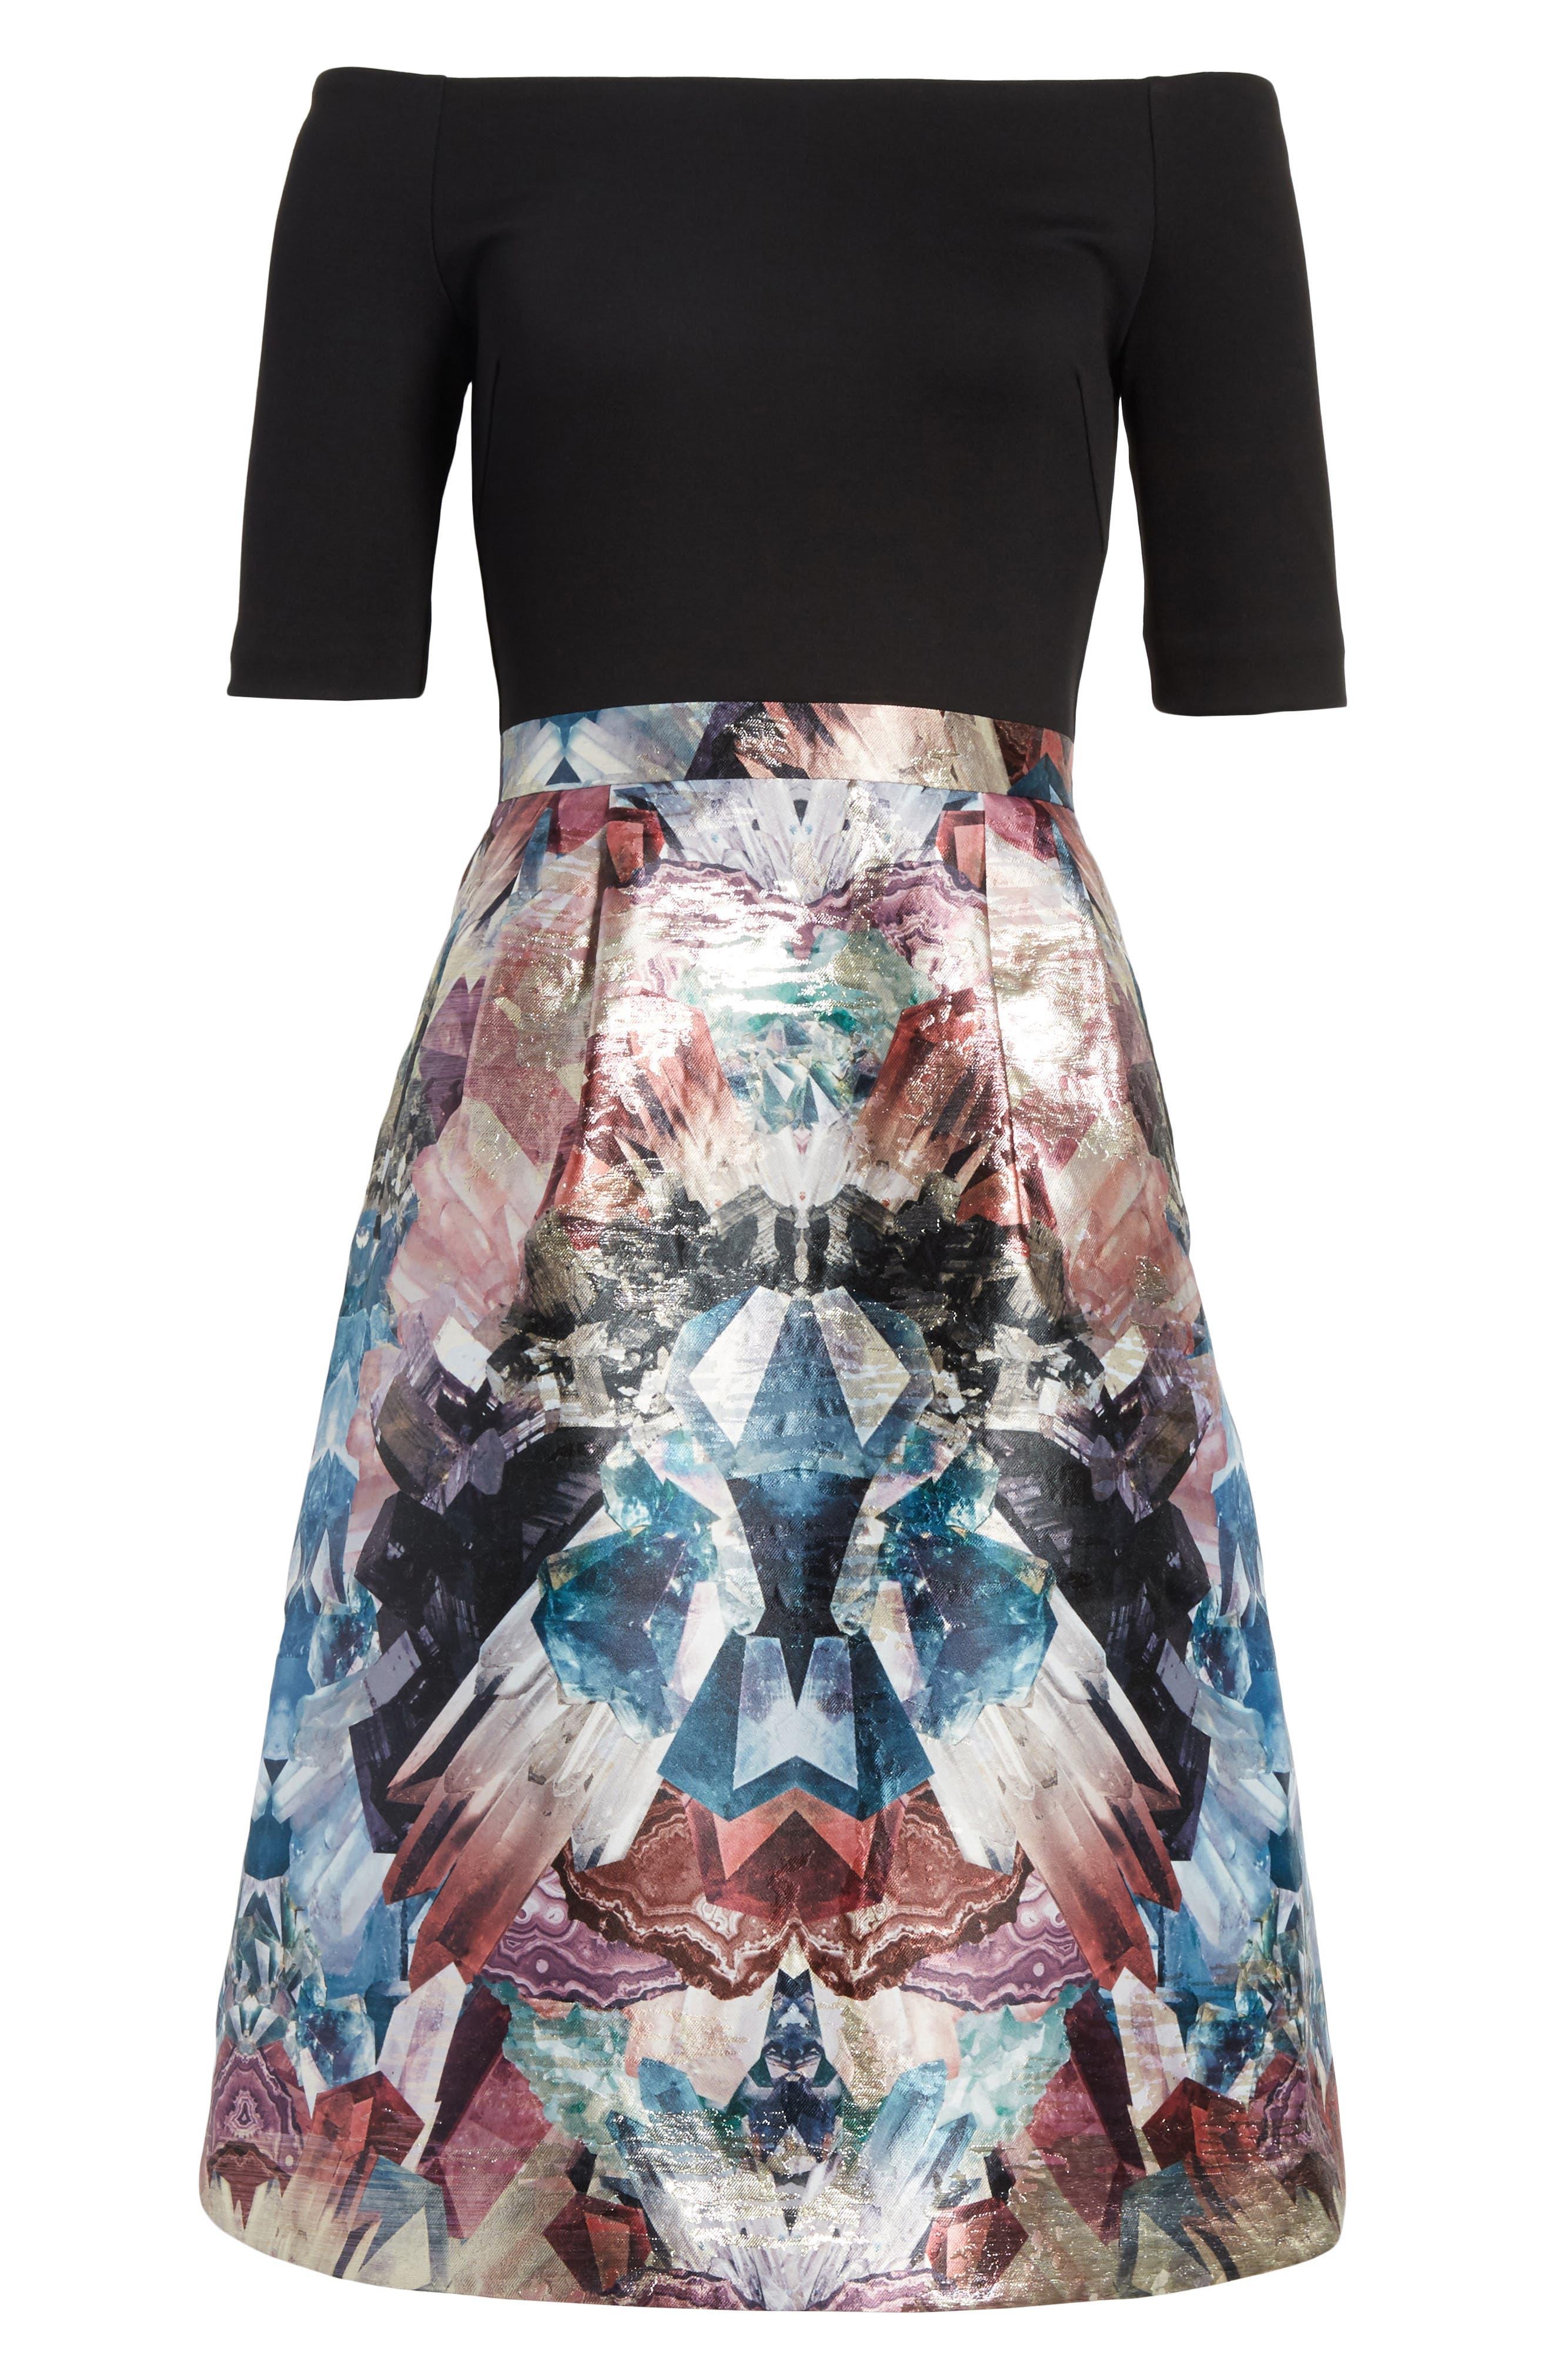 Keris Mirrored Minerals Tulip Fit & Flare Dress,                             Alternate thumbnail 6, color,                             001